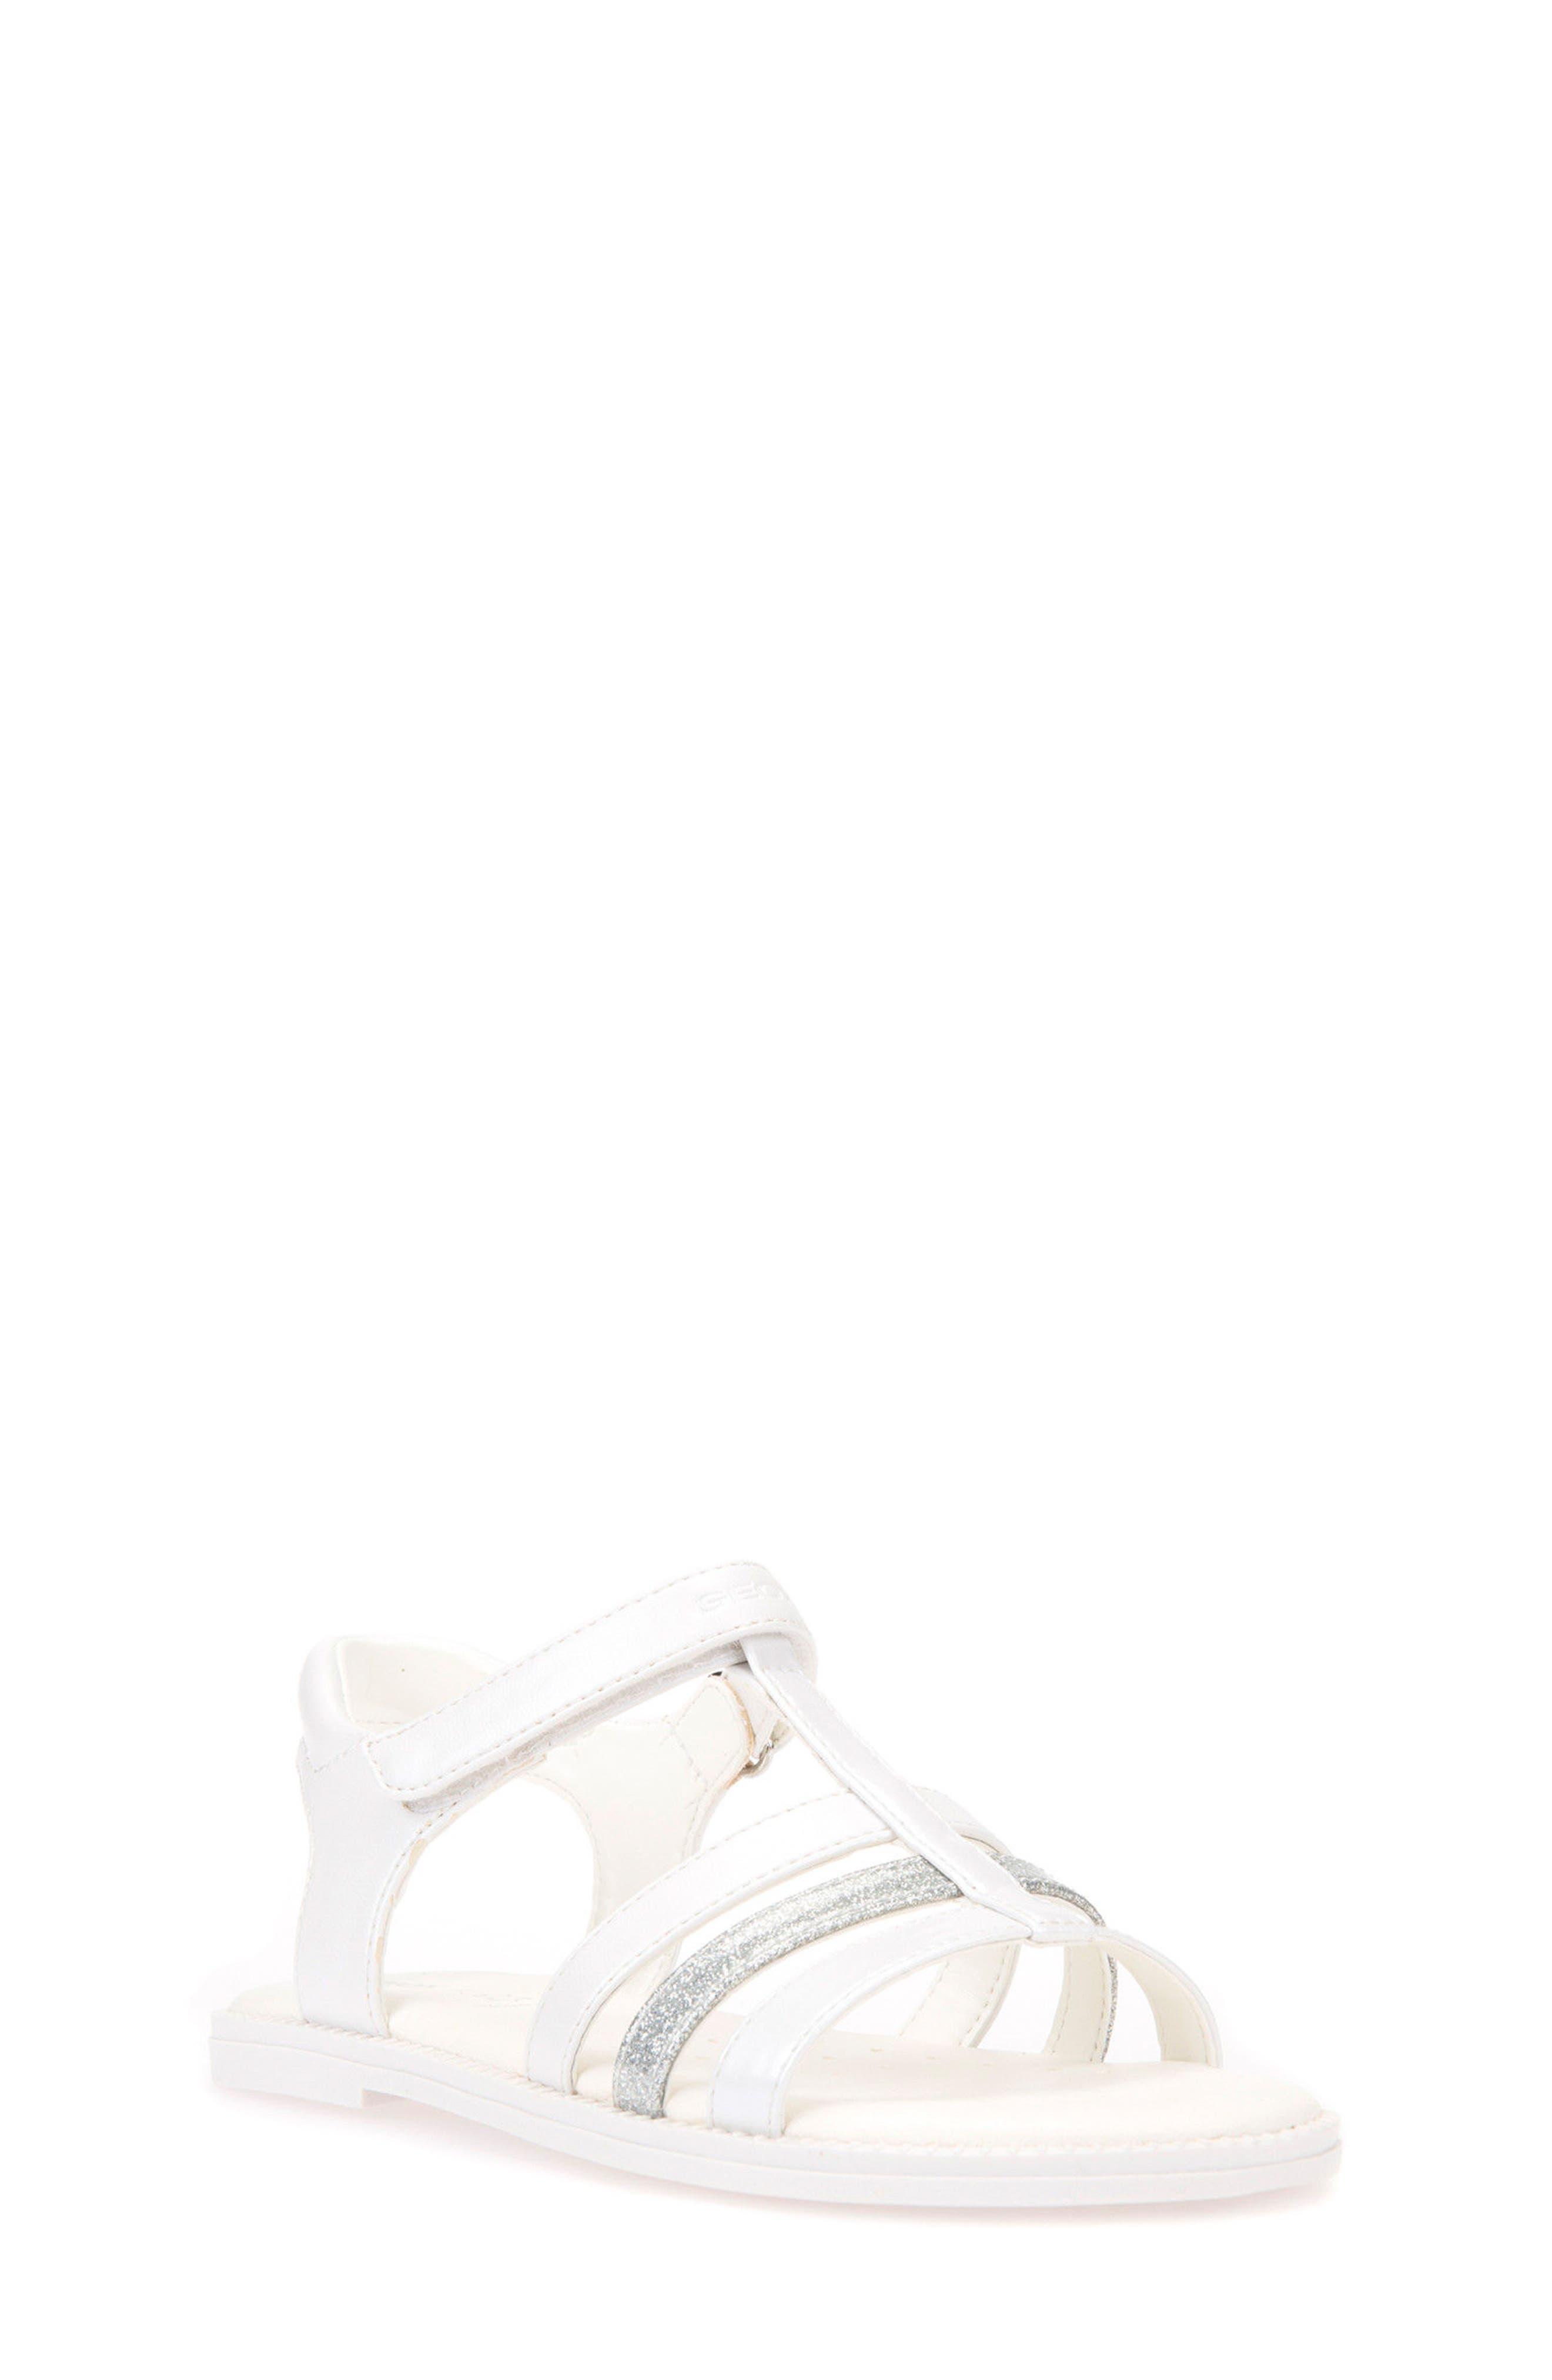 Karly Sandal,                         Main,                         color, WHITE